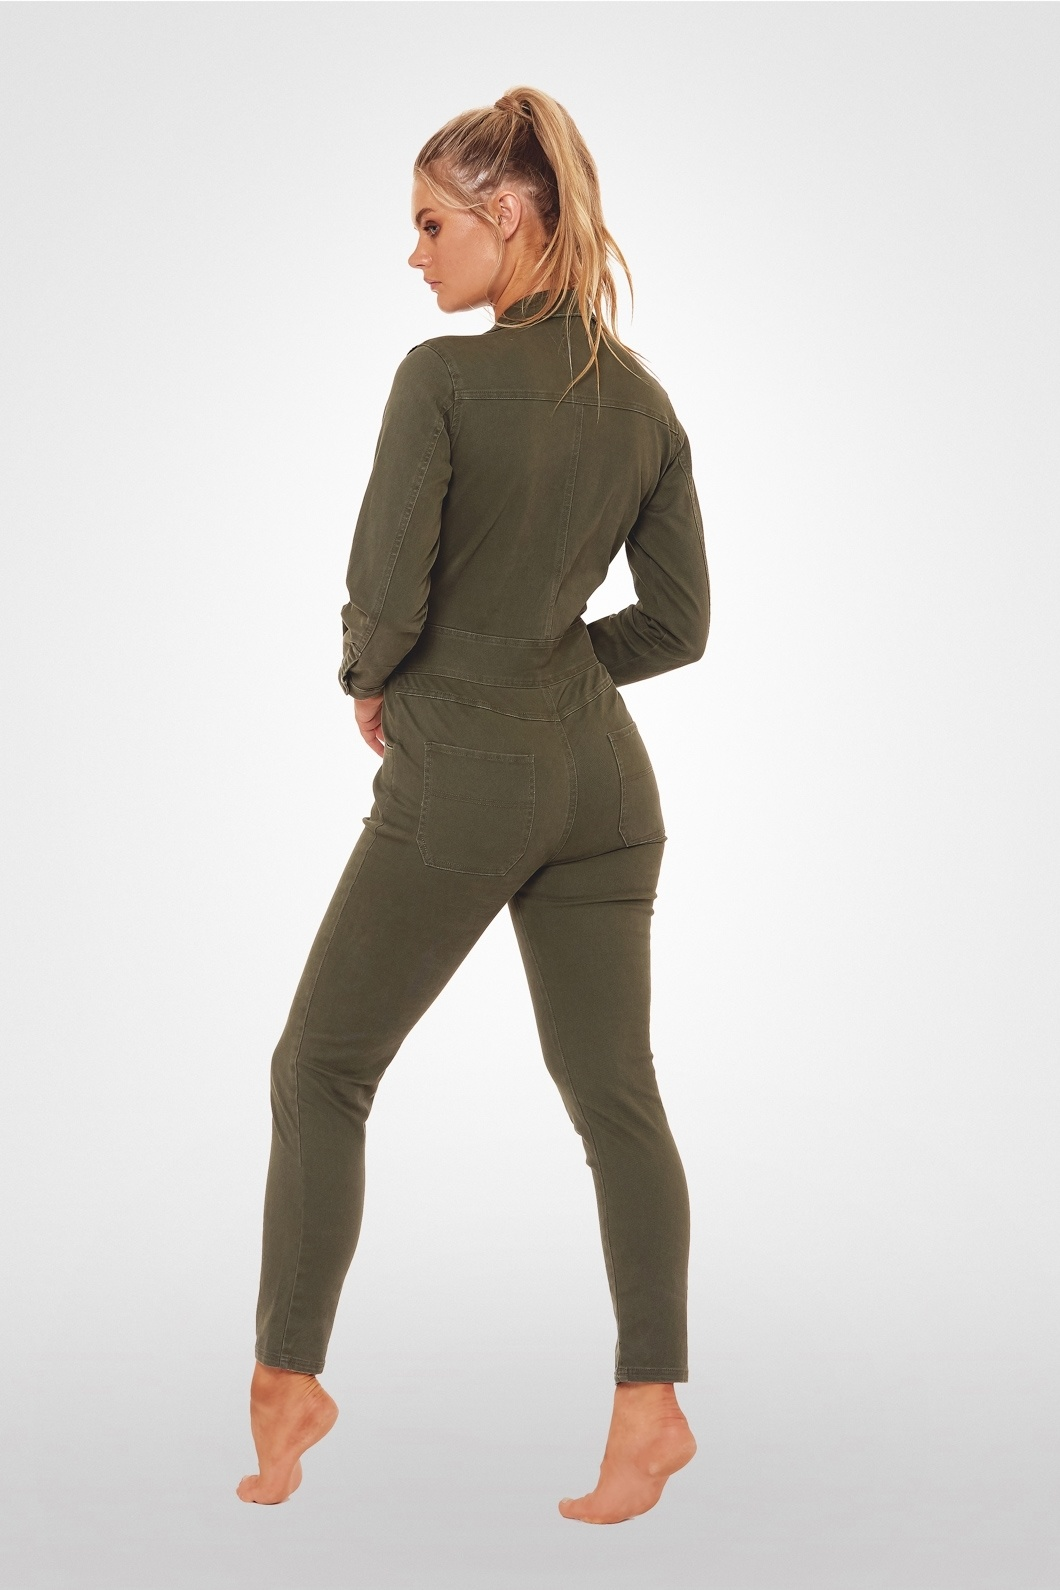 L'urv My Wingwoman Jumpsuit - Army